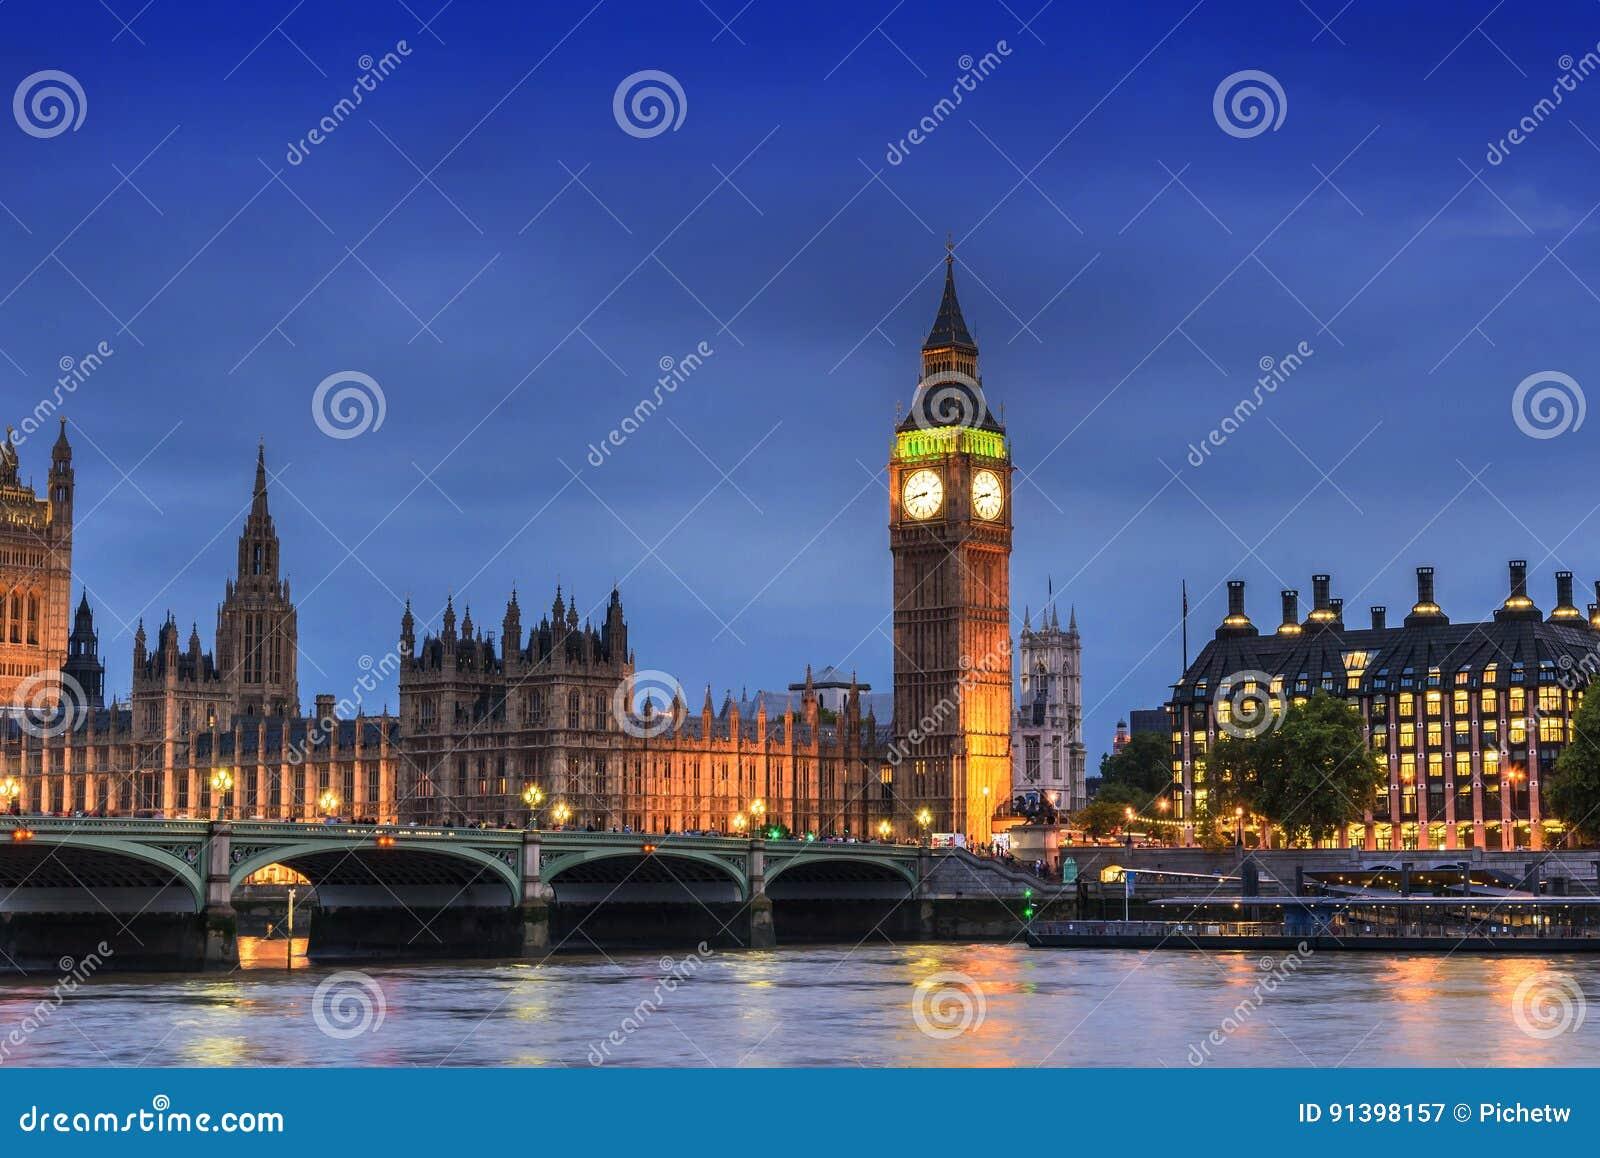 Big Ben e casa do parlamento, Londres, Reino Unido, na noite do crepúsculo